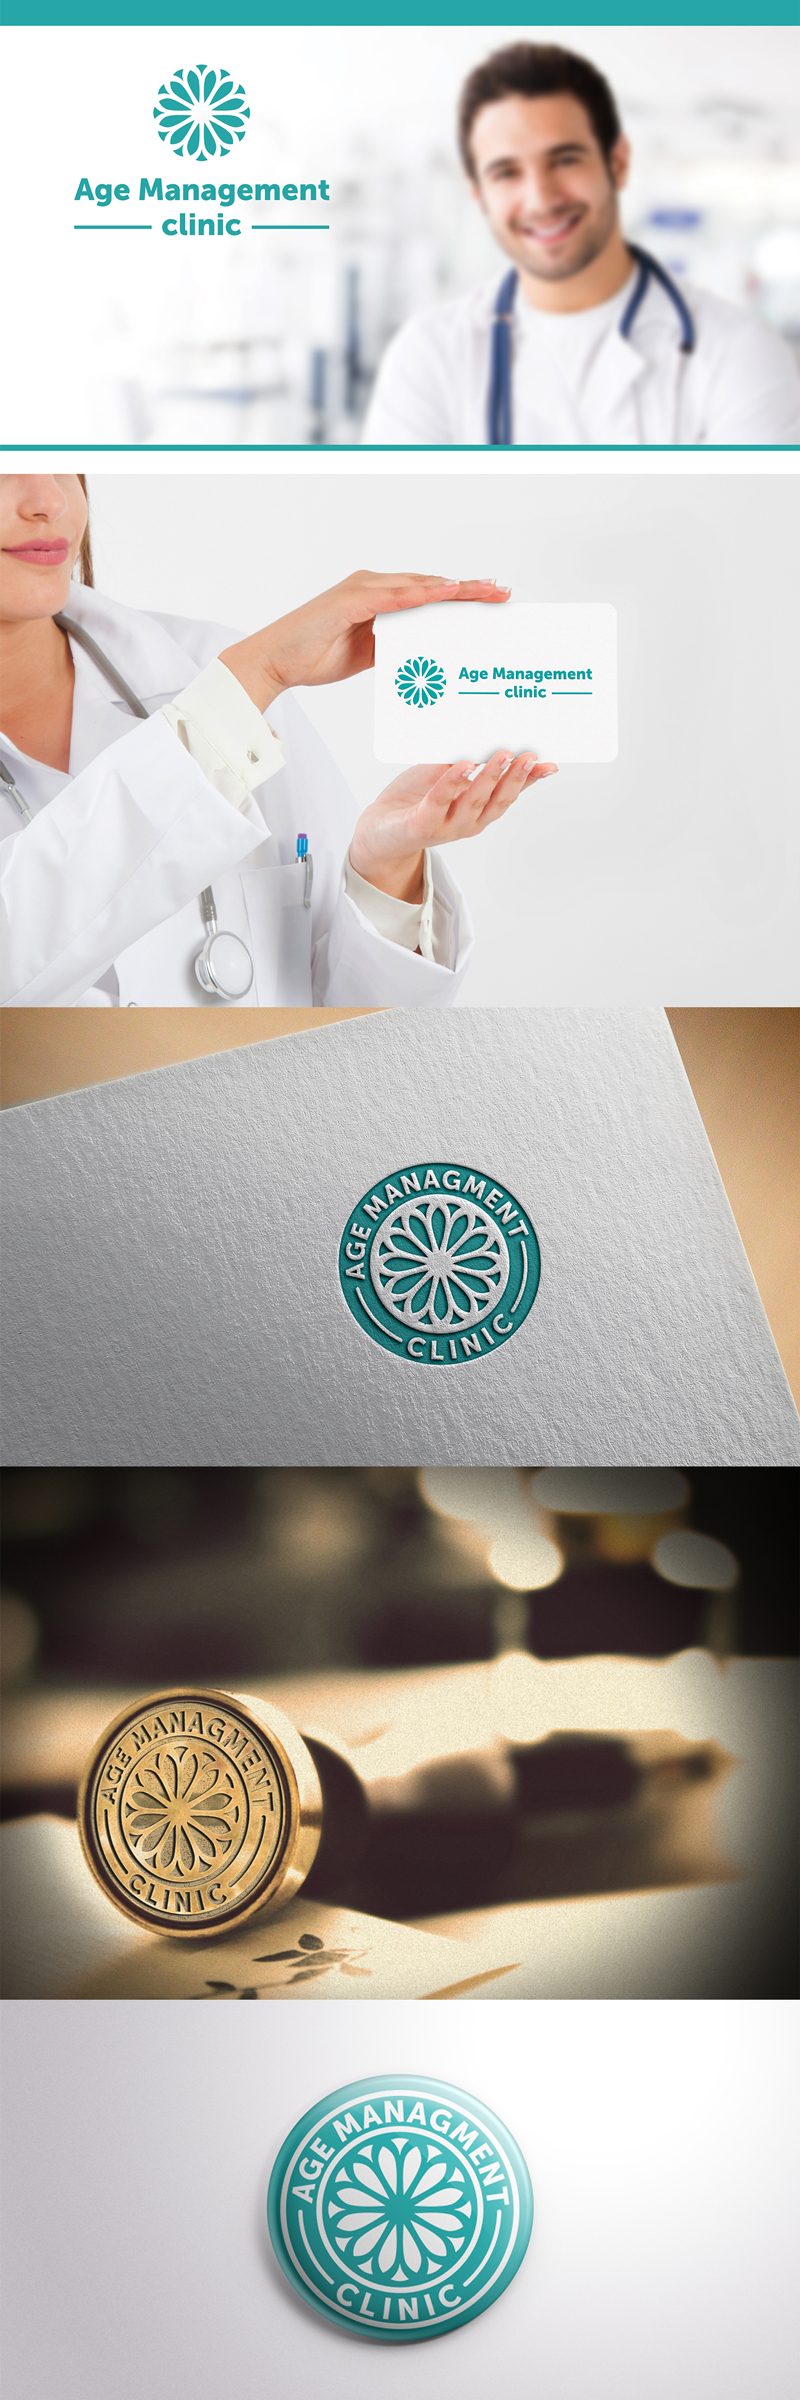 Логотип для медицинского центра (клиники)  фото f_3765ba12f1eca86d.jpg